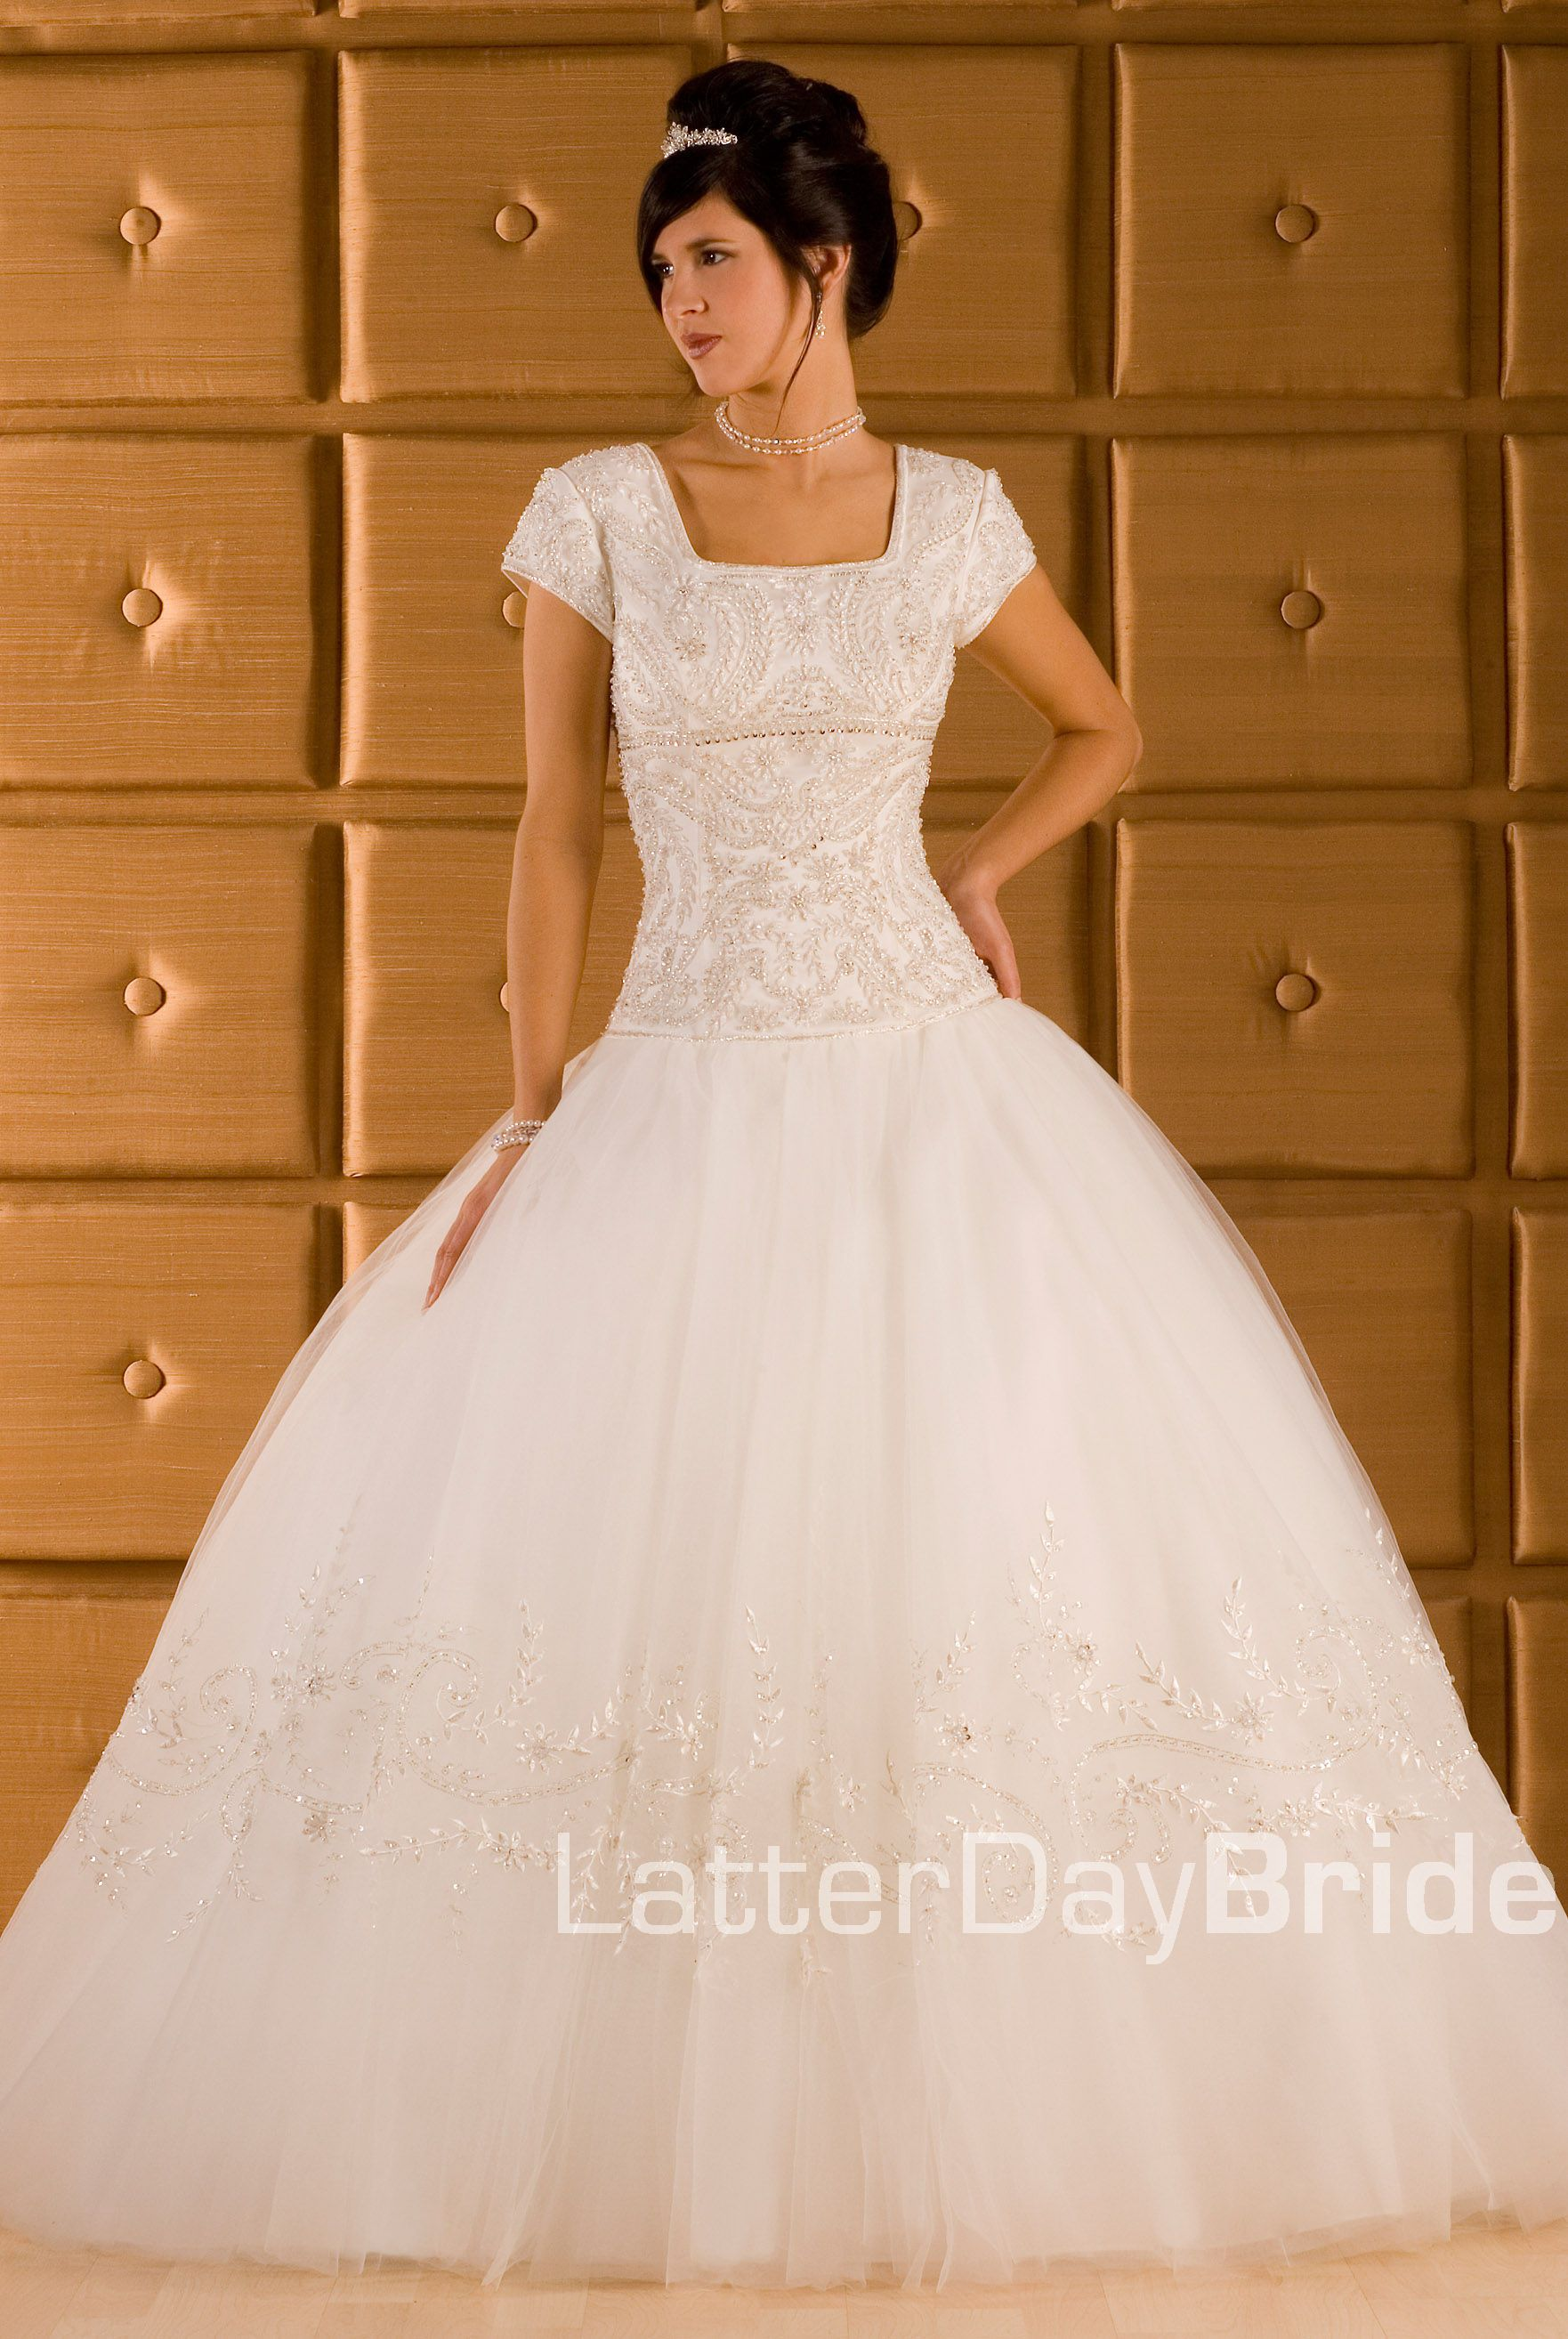 Young girls wedding dresses  Modest Wedding Dress  dresses  Pinterest  Modest wedding dresses